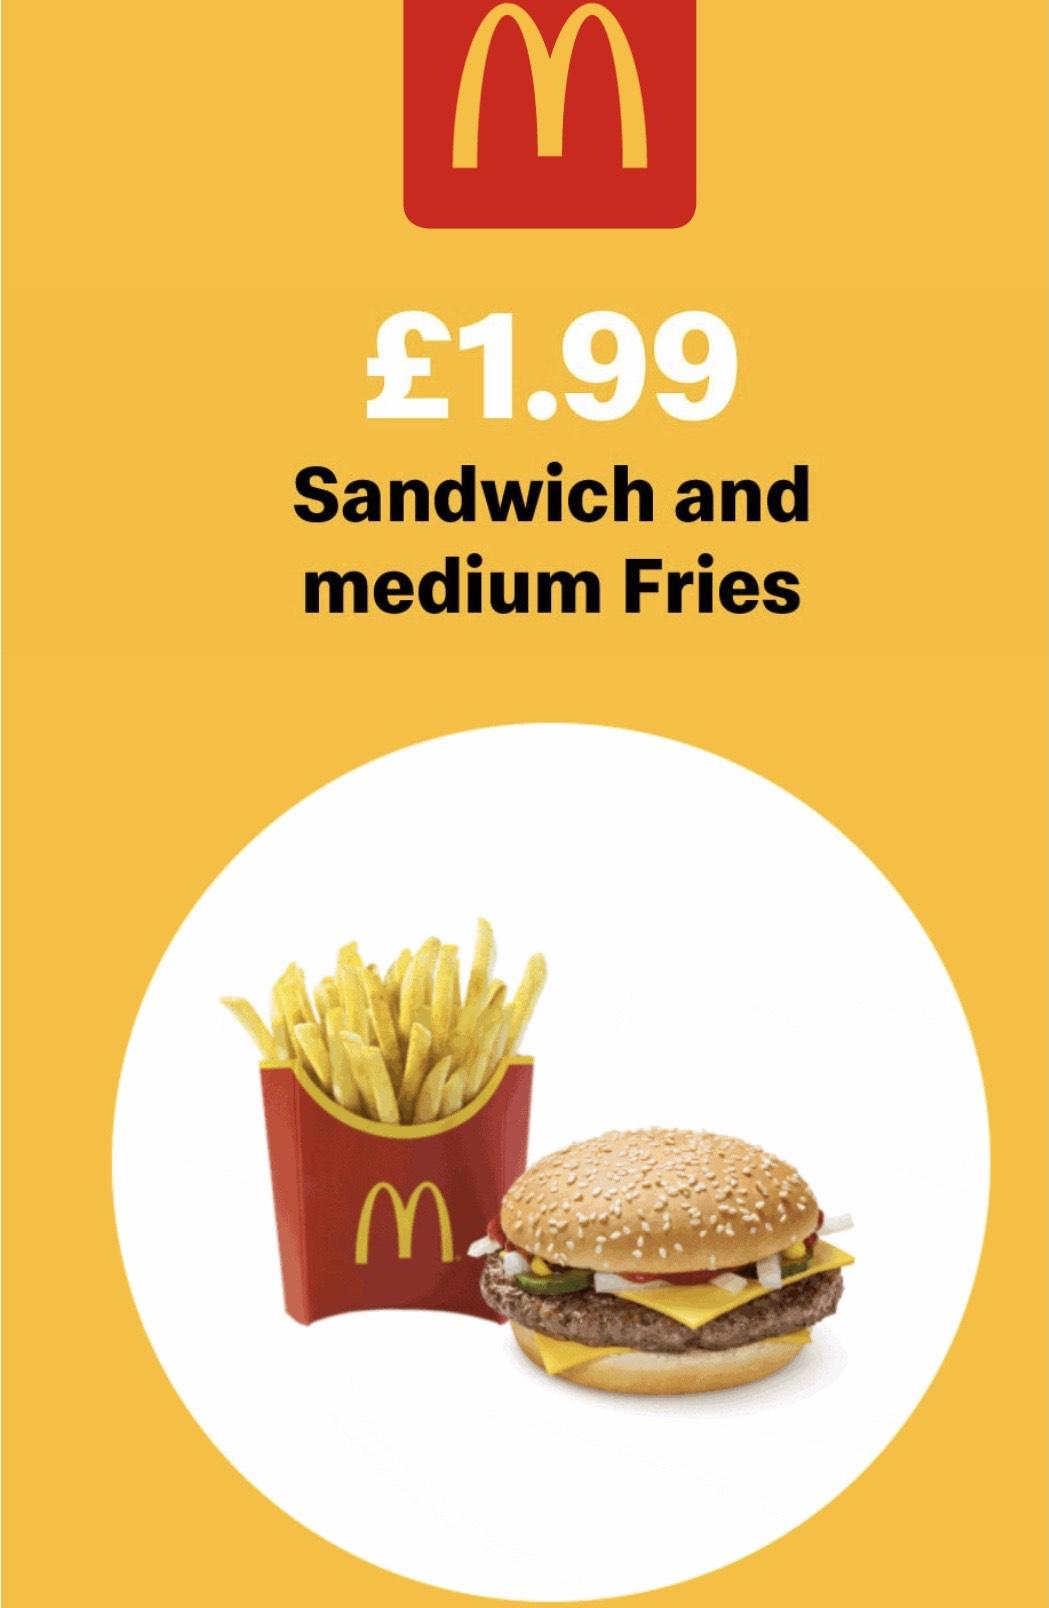 Sandwich and medium fries £1.99 via the app at McDonalds